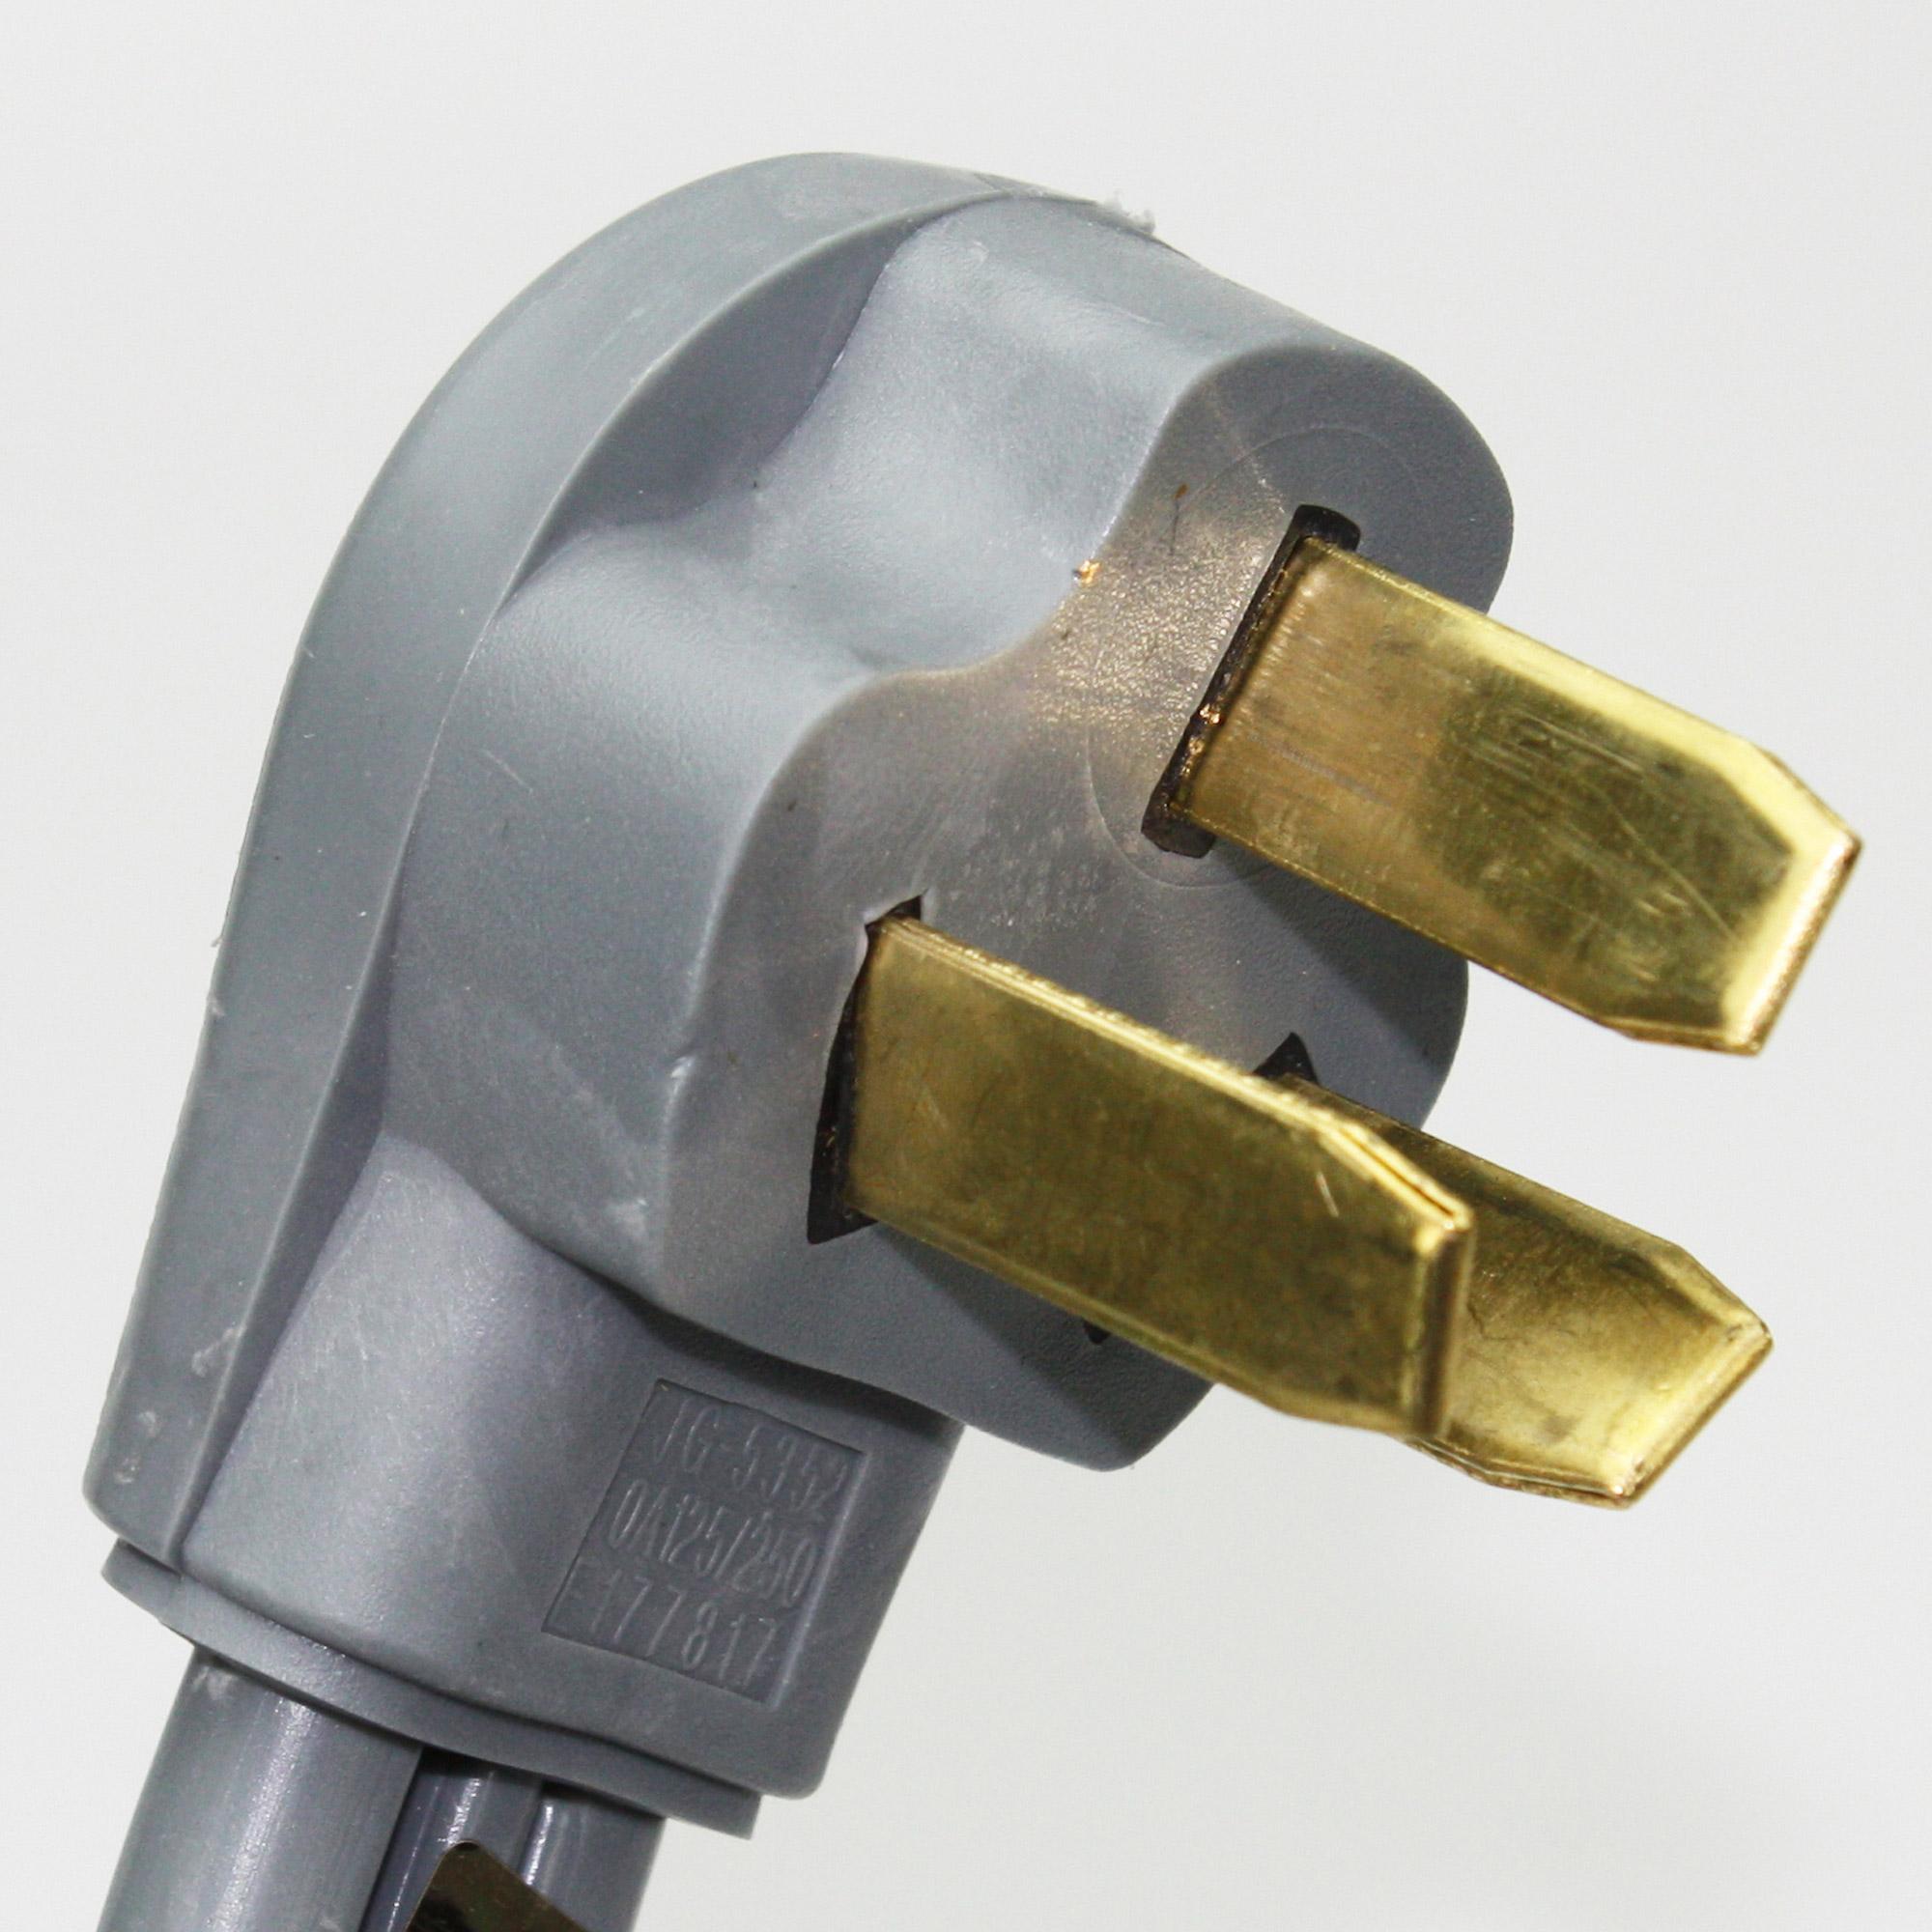 range stove oven power cord 3 wire 5 39 long 50a 220 250v. Black Bedroom Furniture Sets. Home Design Ideas